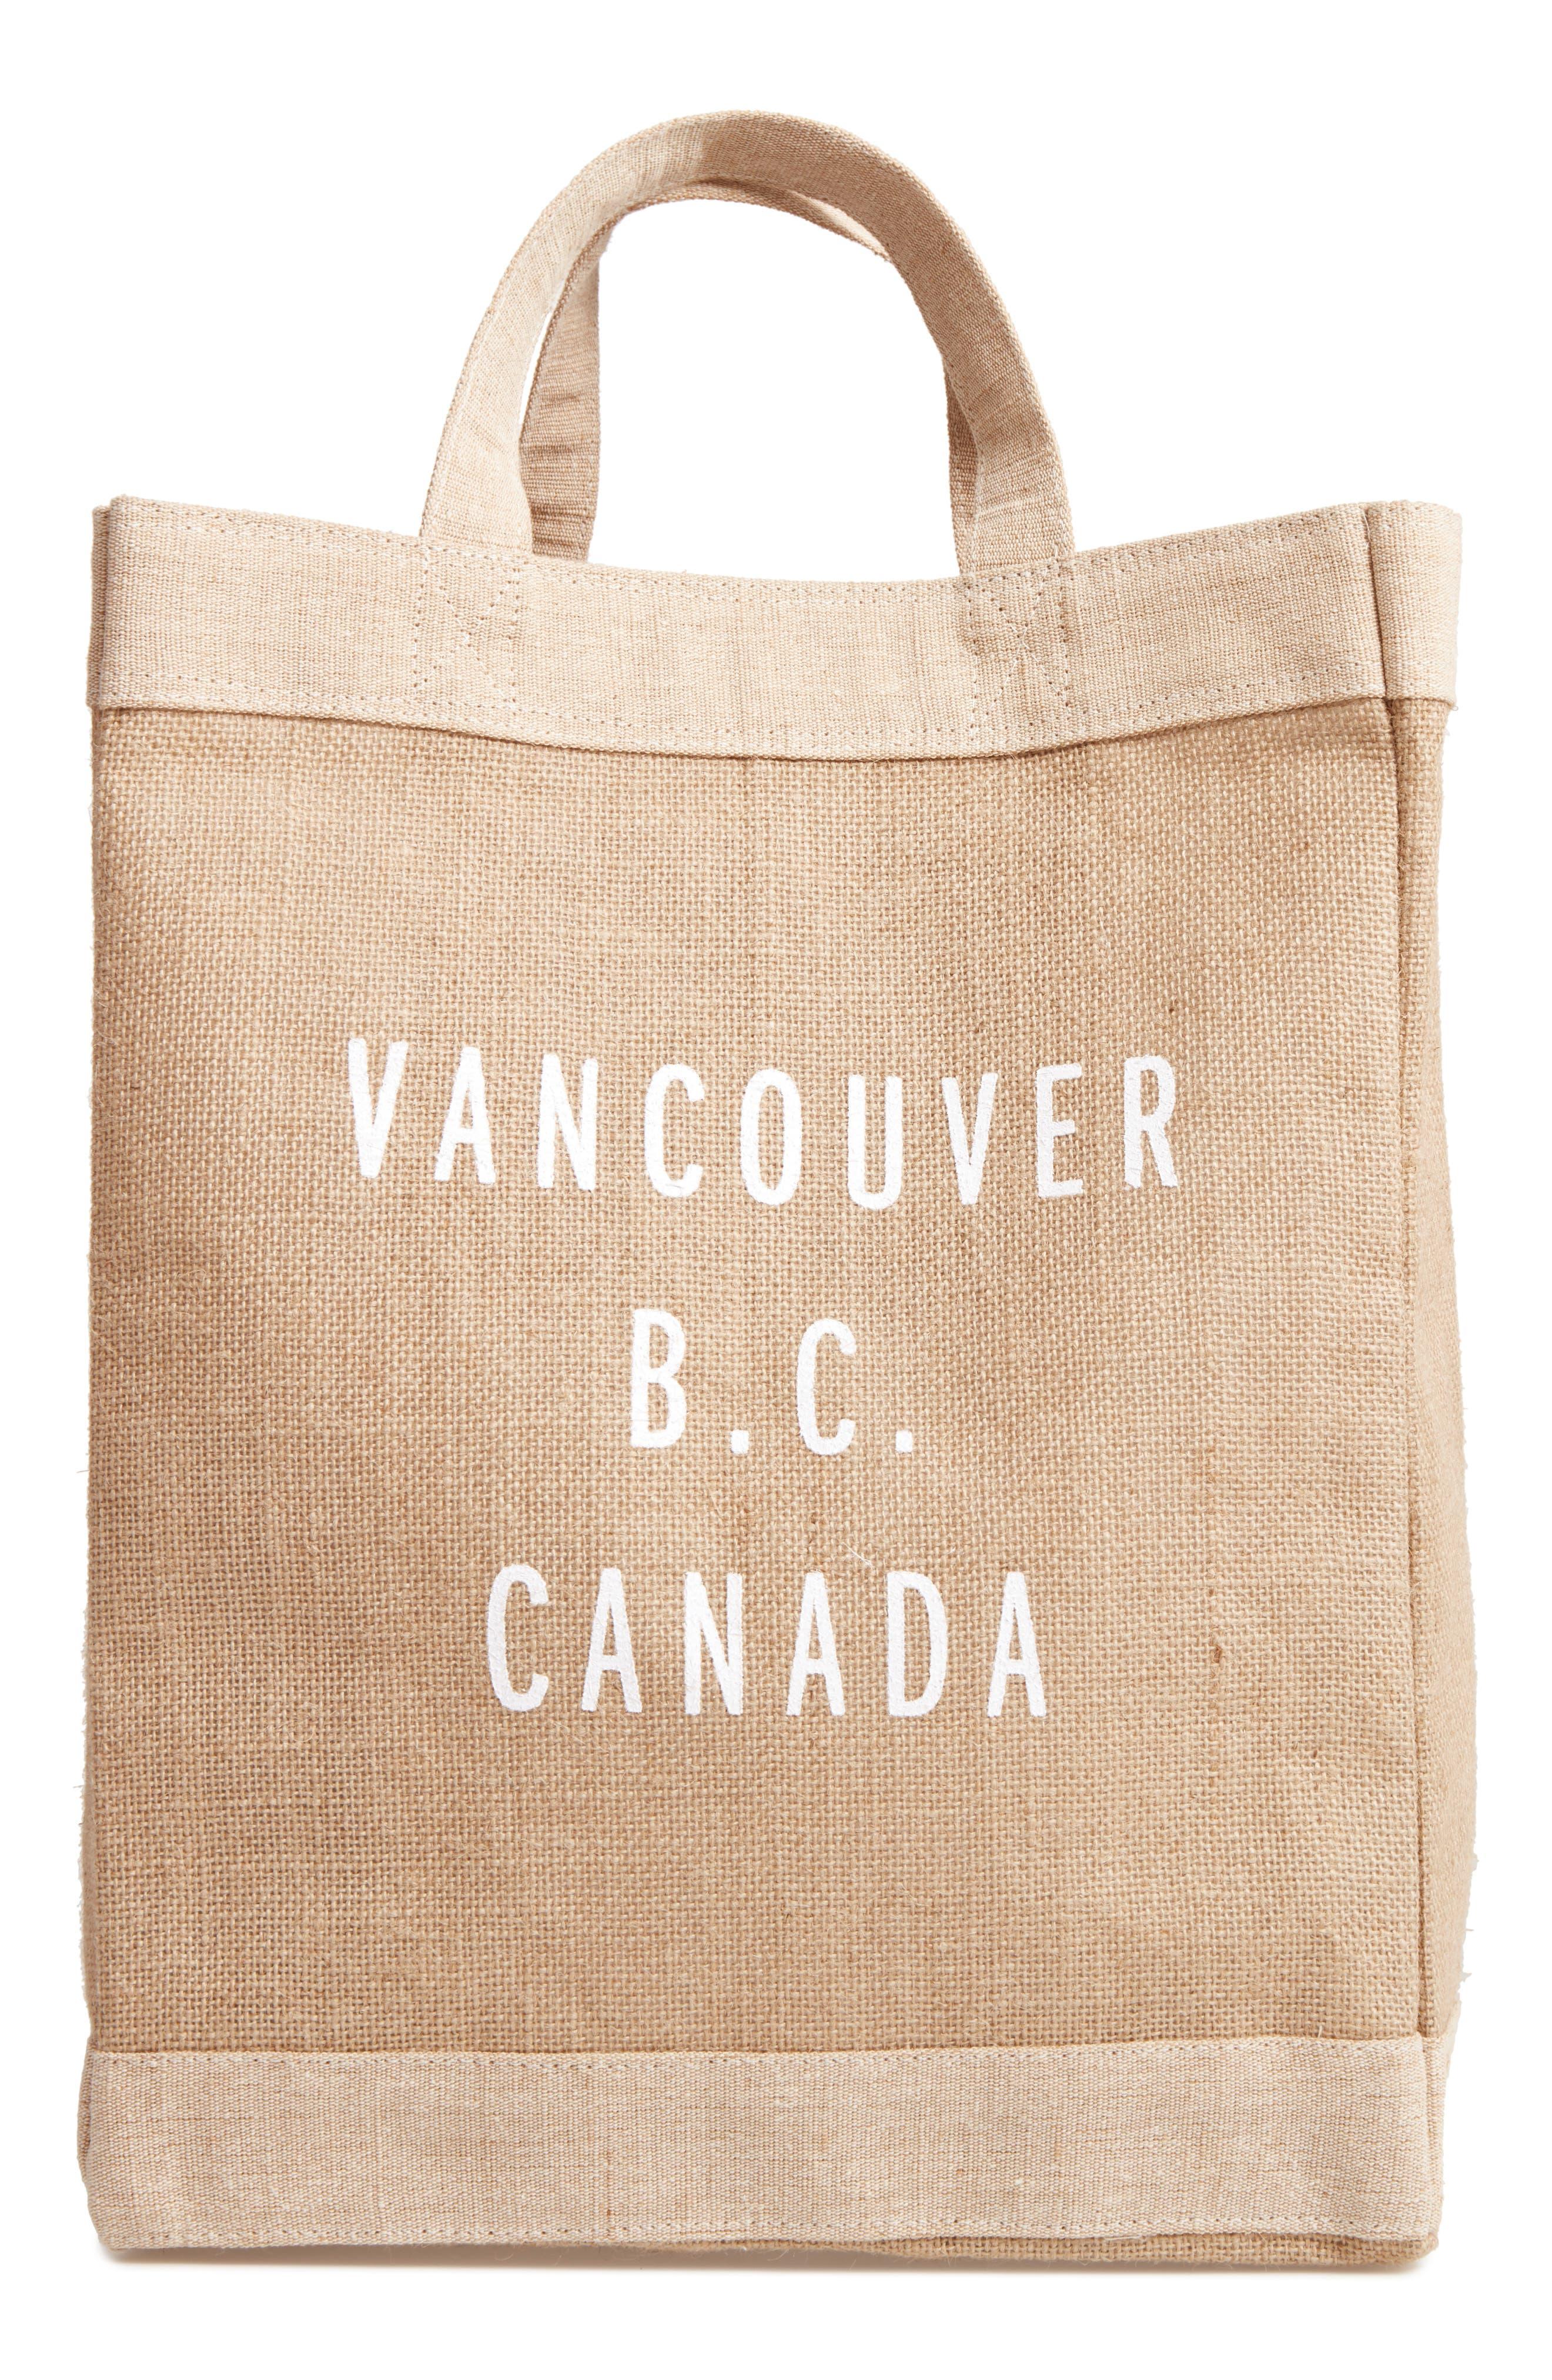 Vancouver Simple Market Bag,                         Main,                         color, Natural